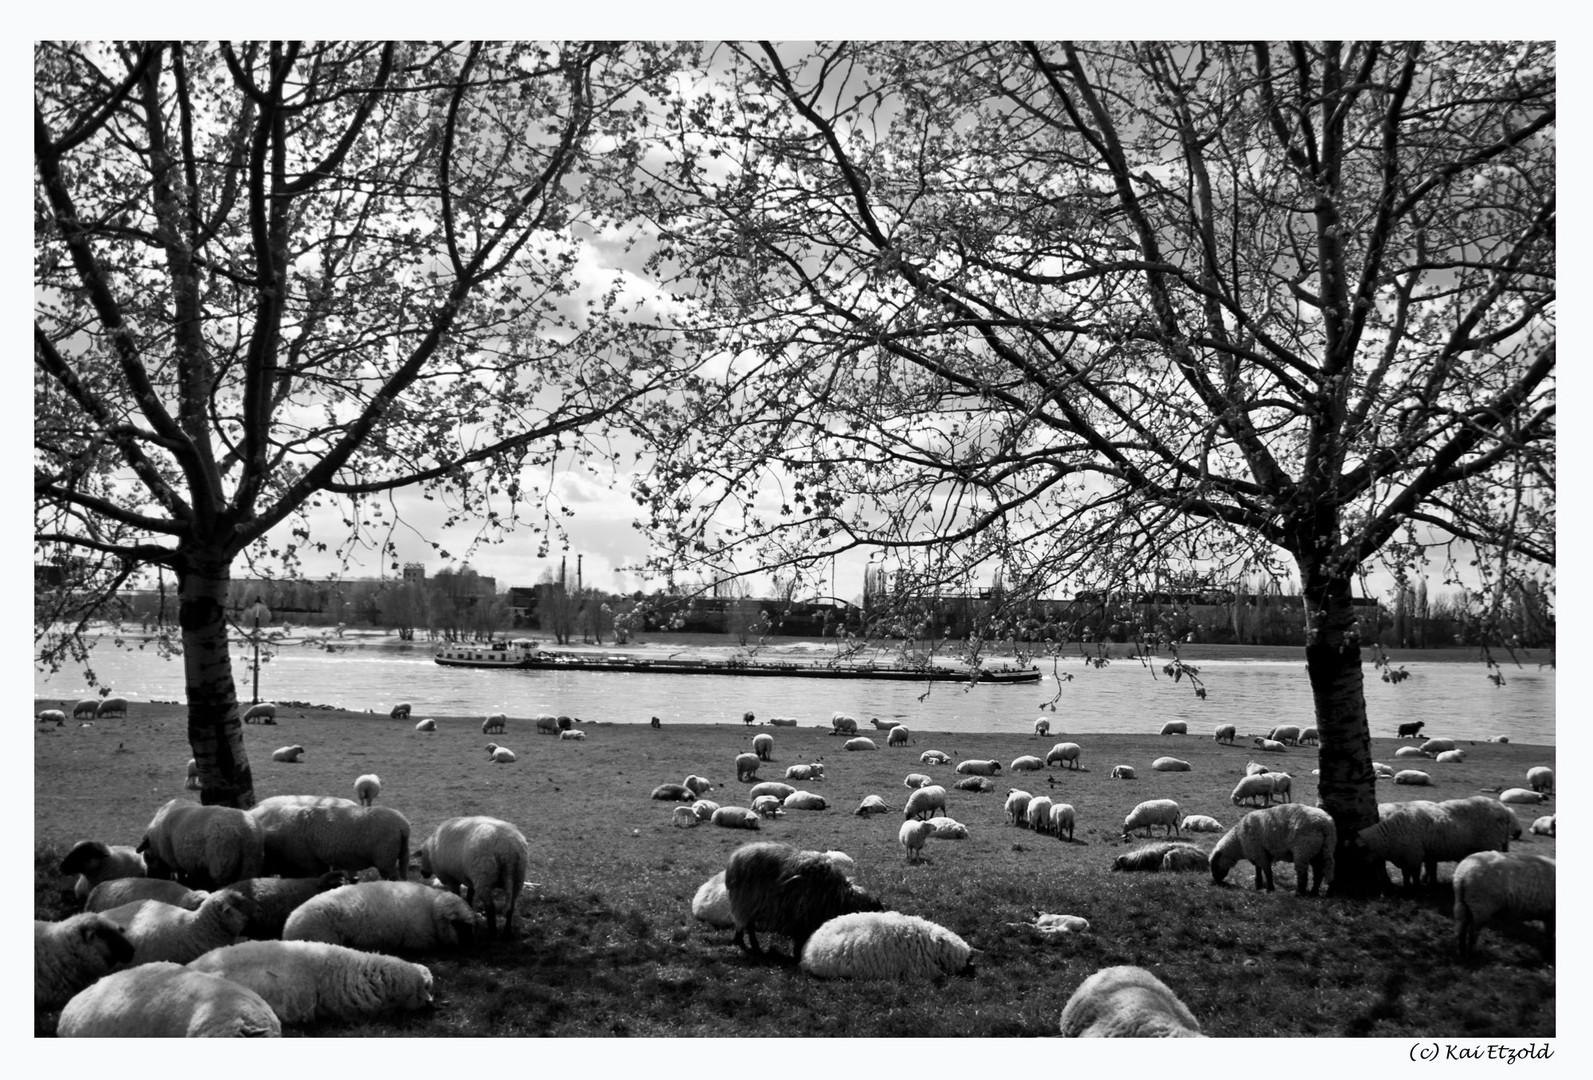 Zu Ostern am Rhein in s/w